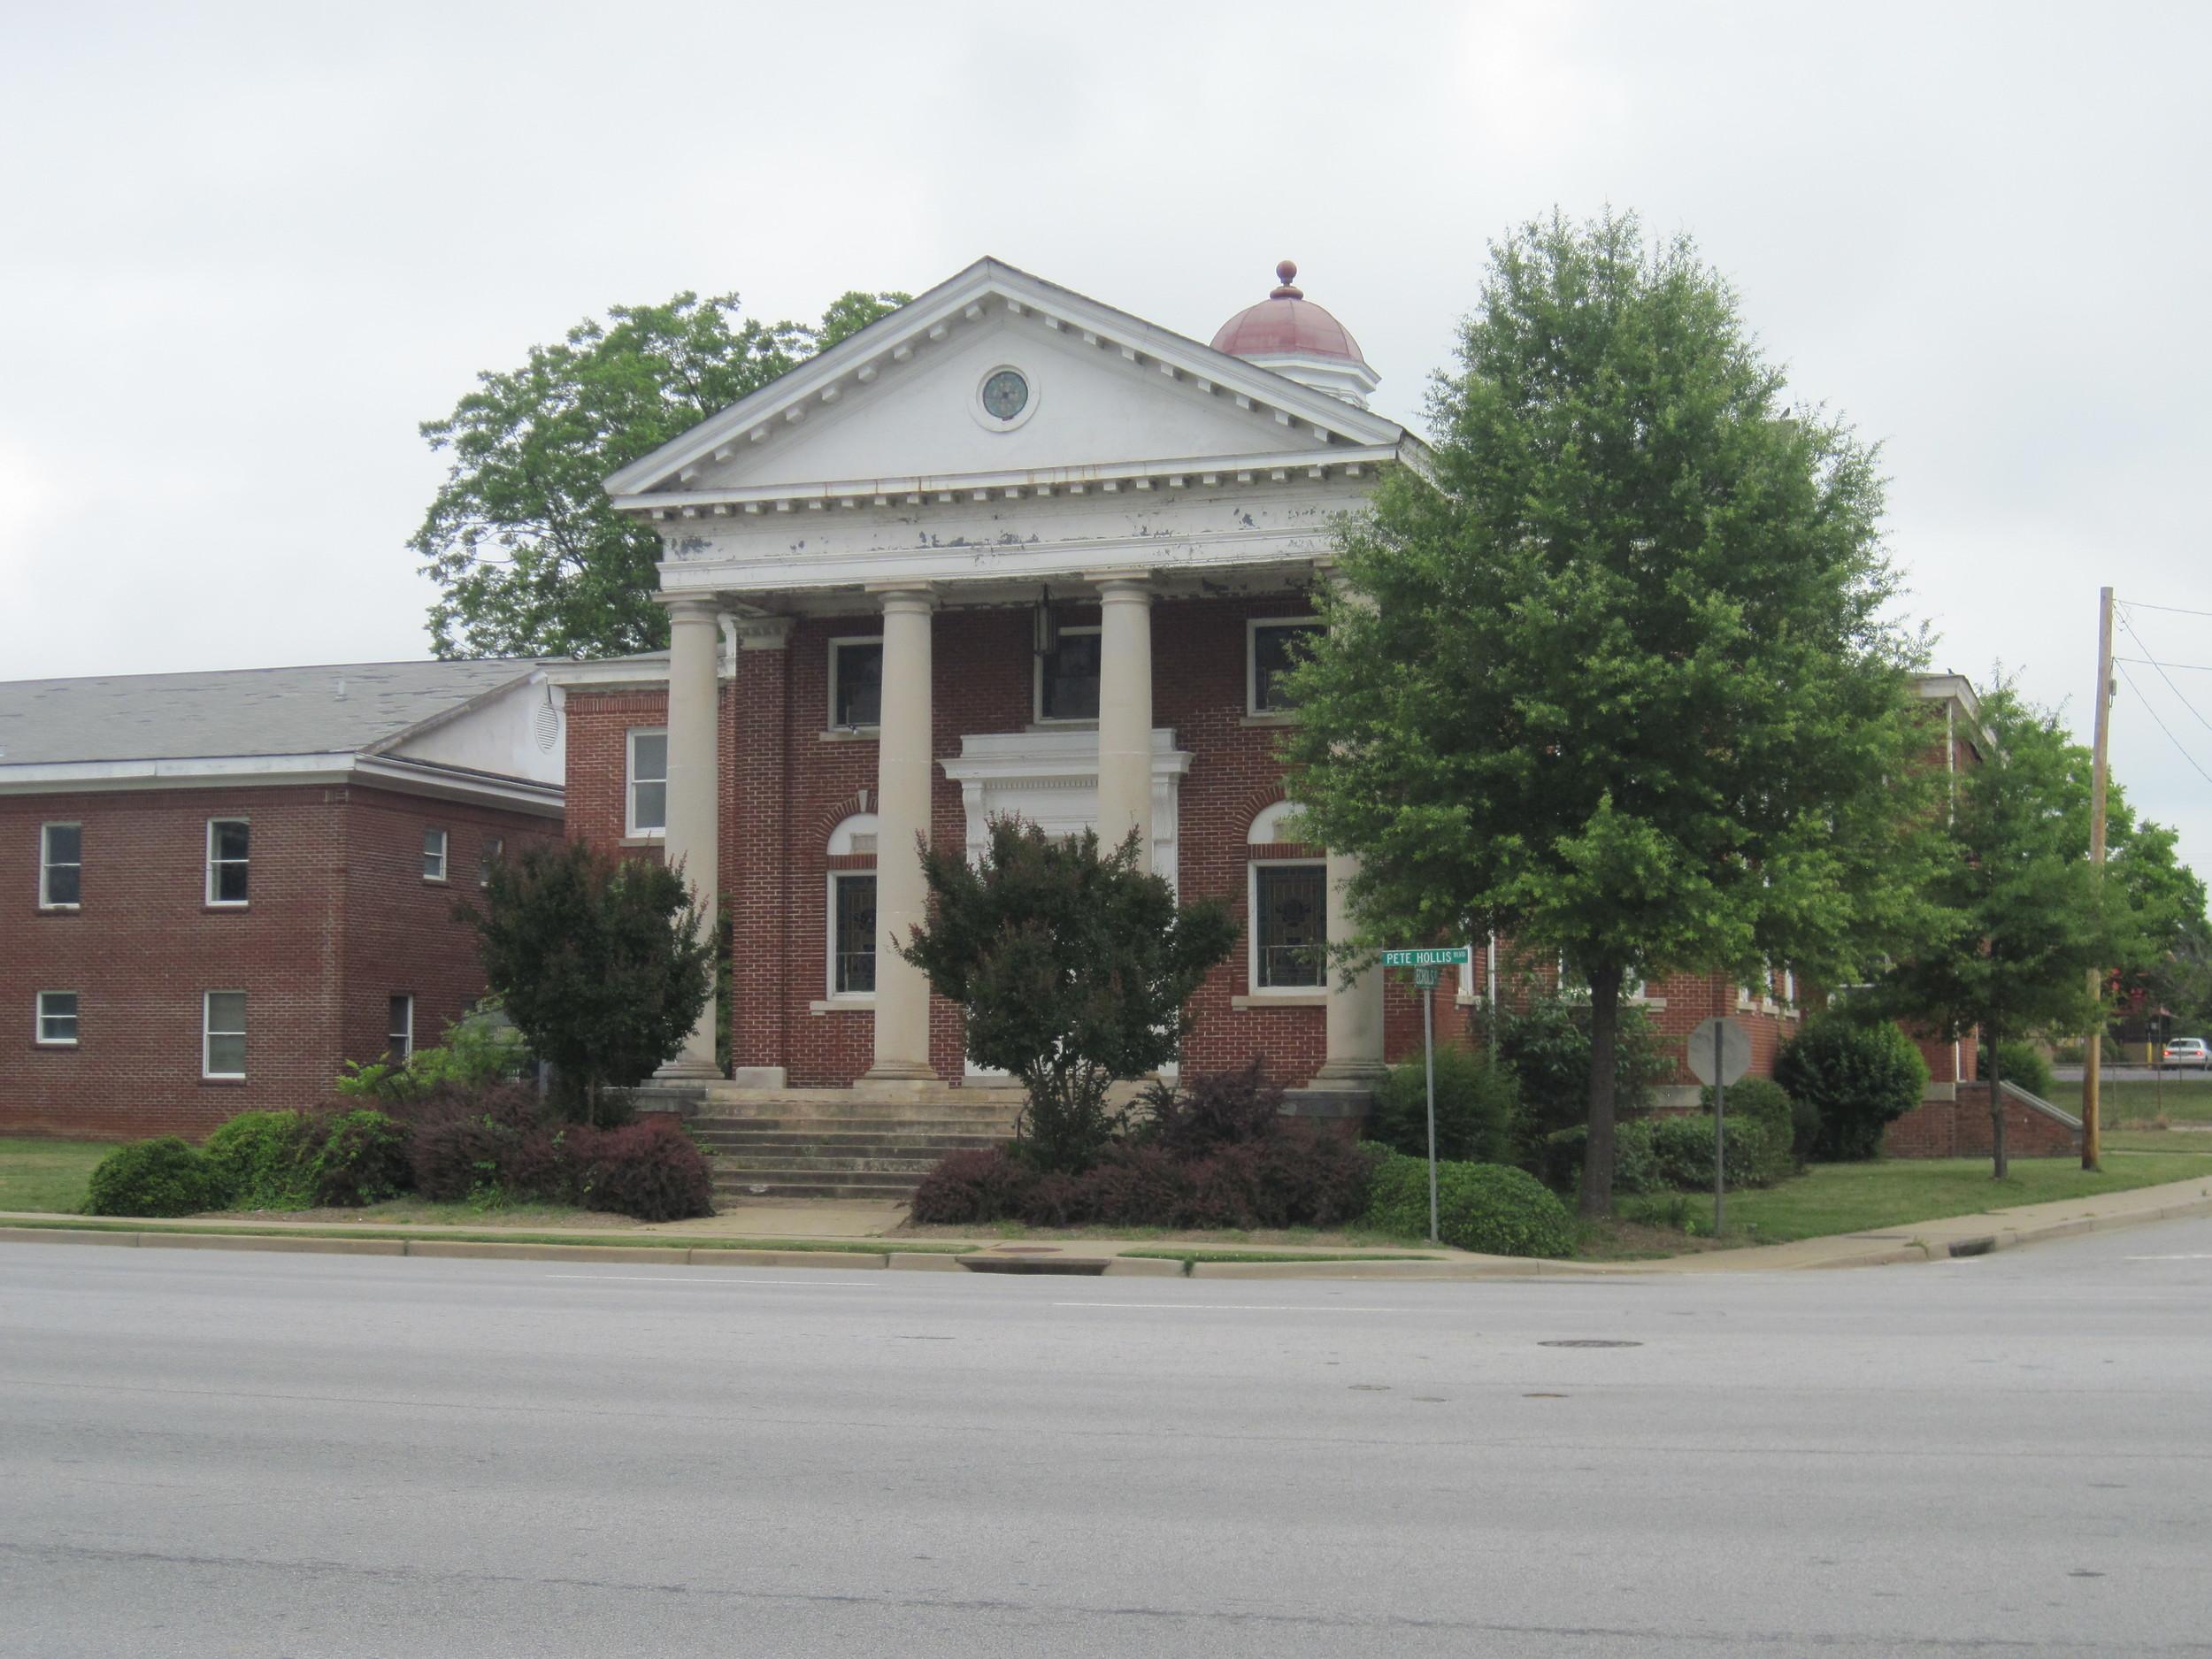 Trinity Church of Greenville